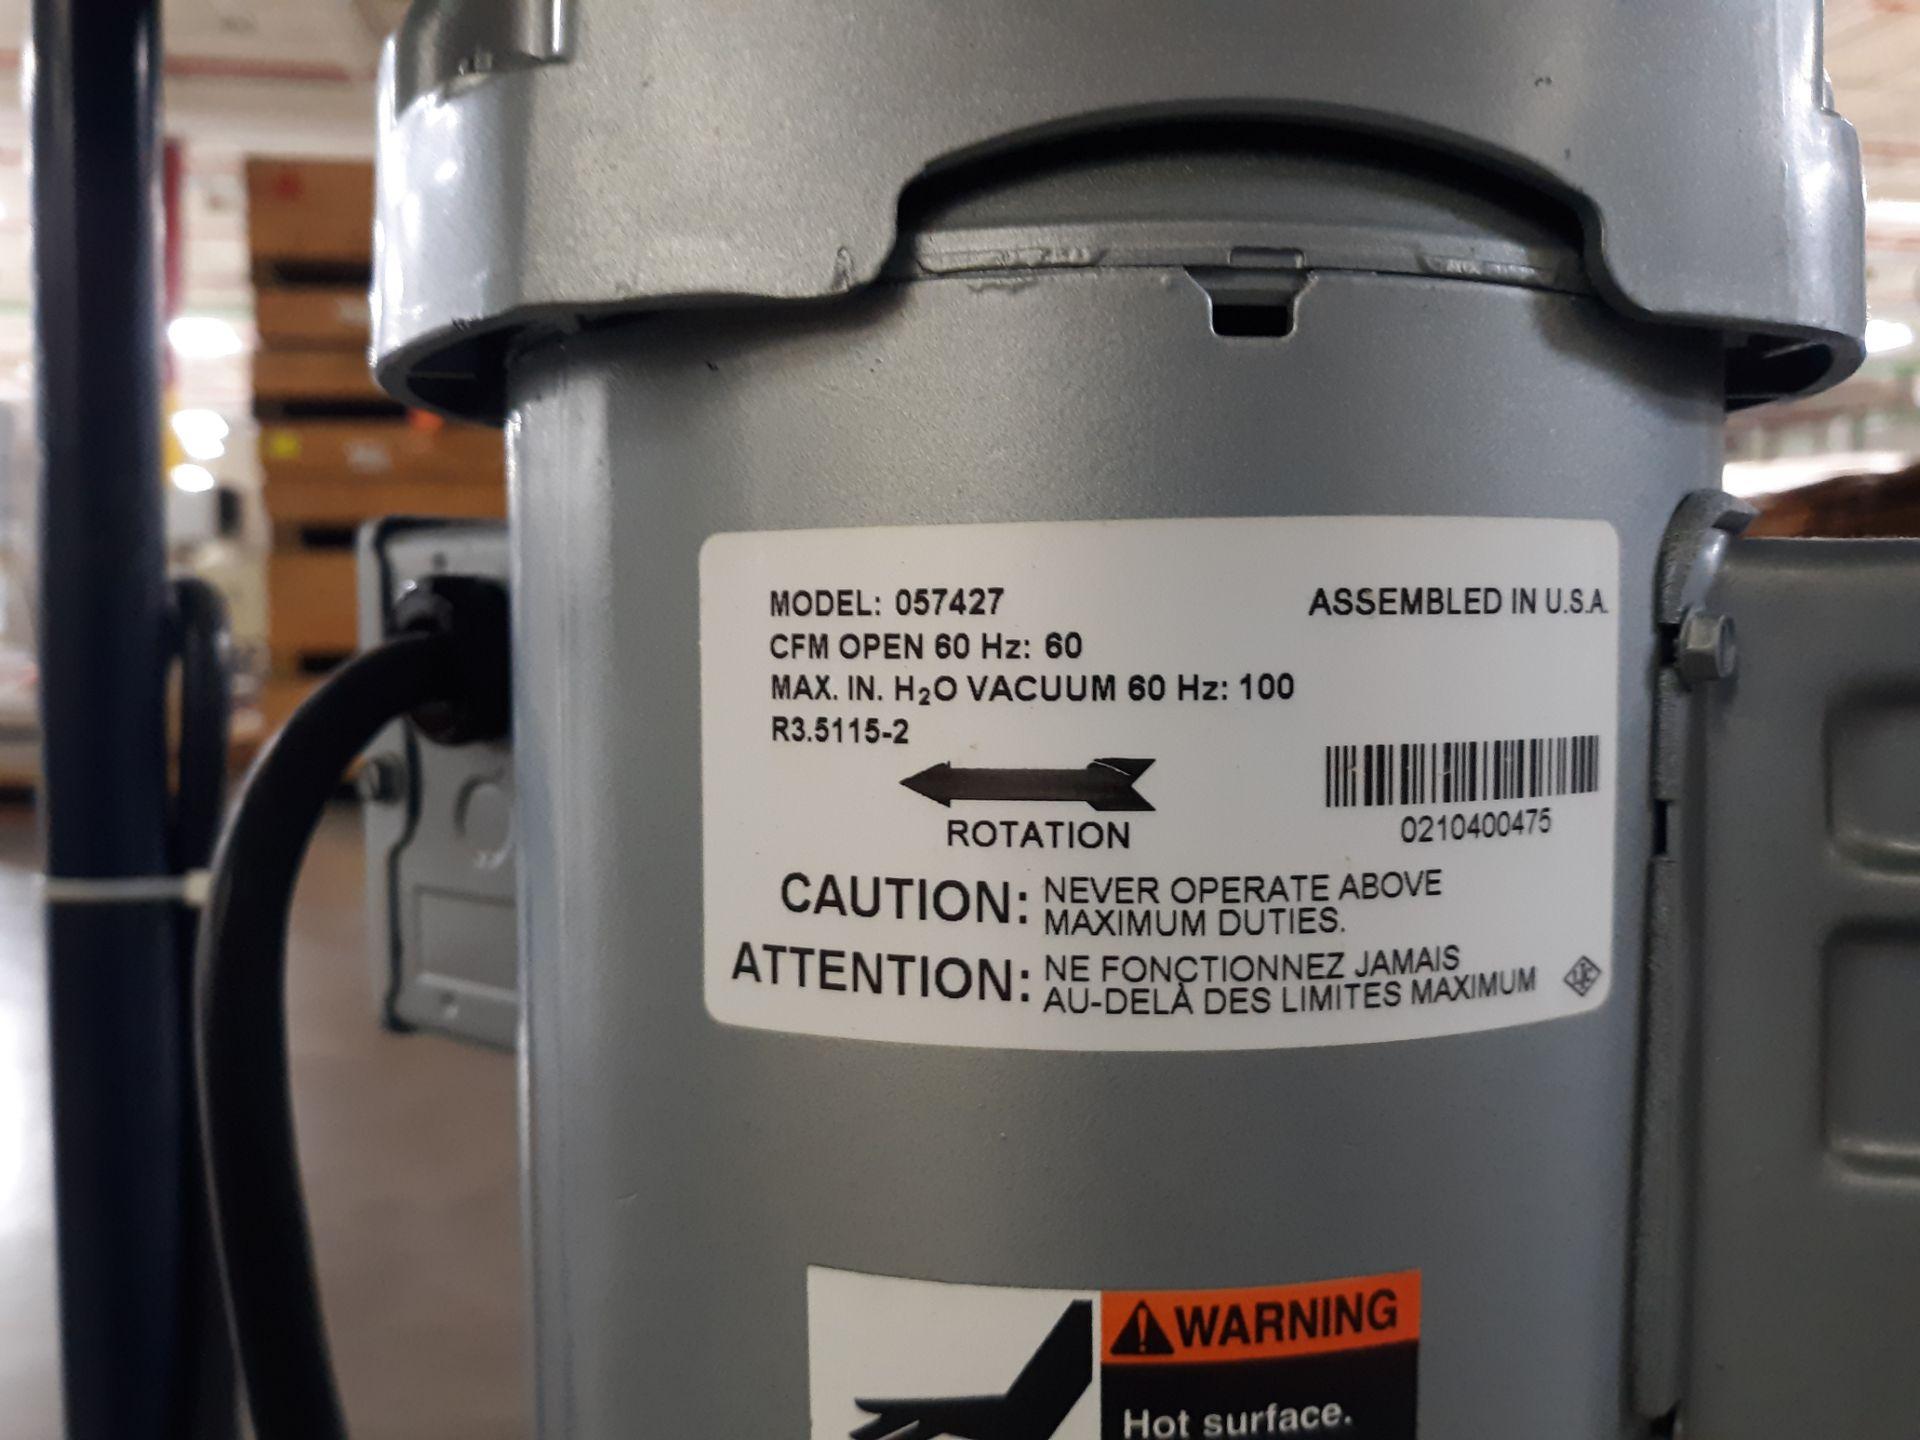 Lot 53 - EMERSON VACUUM PUMP MODEL-057427 CMF OPEN 60HZ MAX IN H2O VACUUM 60 HZ@100; RIGGING FEE: $10